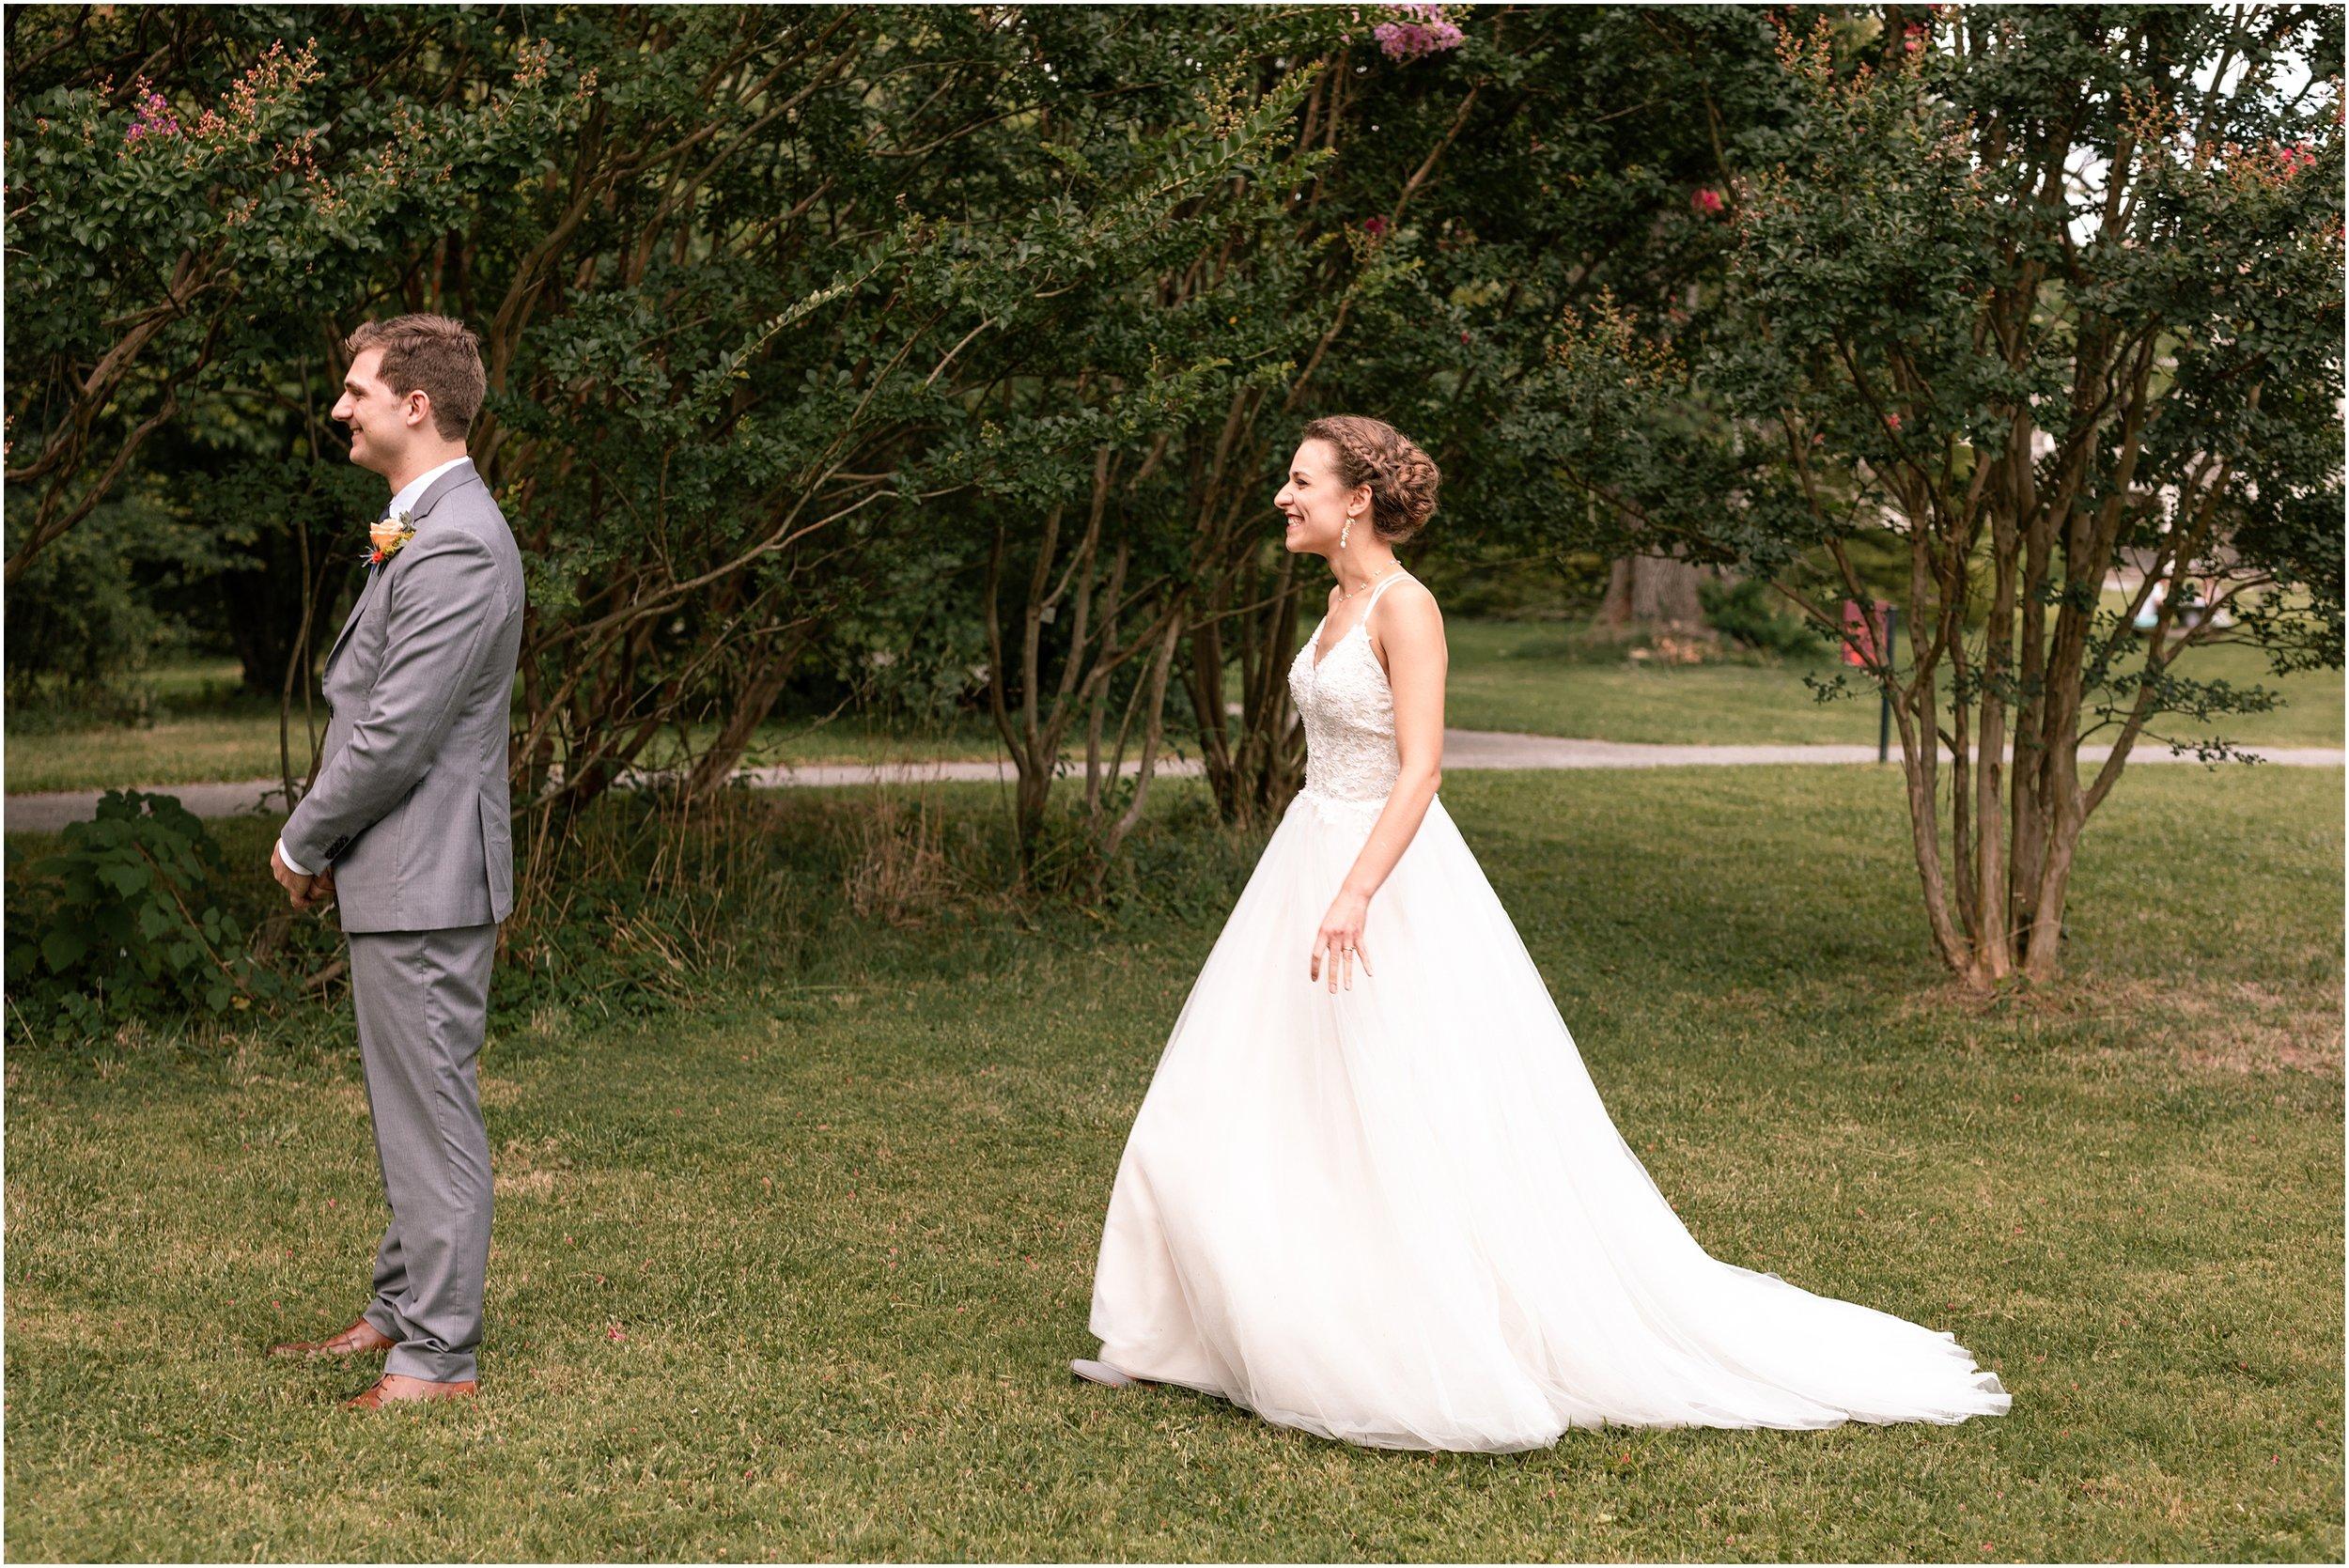 hannah leigh photography Cylburn Arboretum Wedding Baltimore, MD_3410.jpg